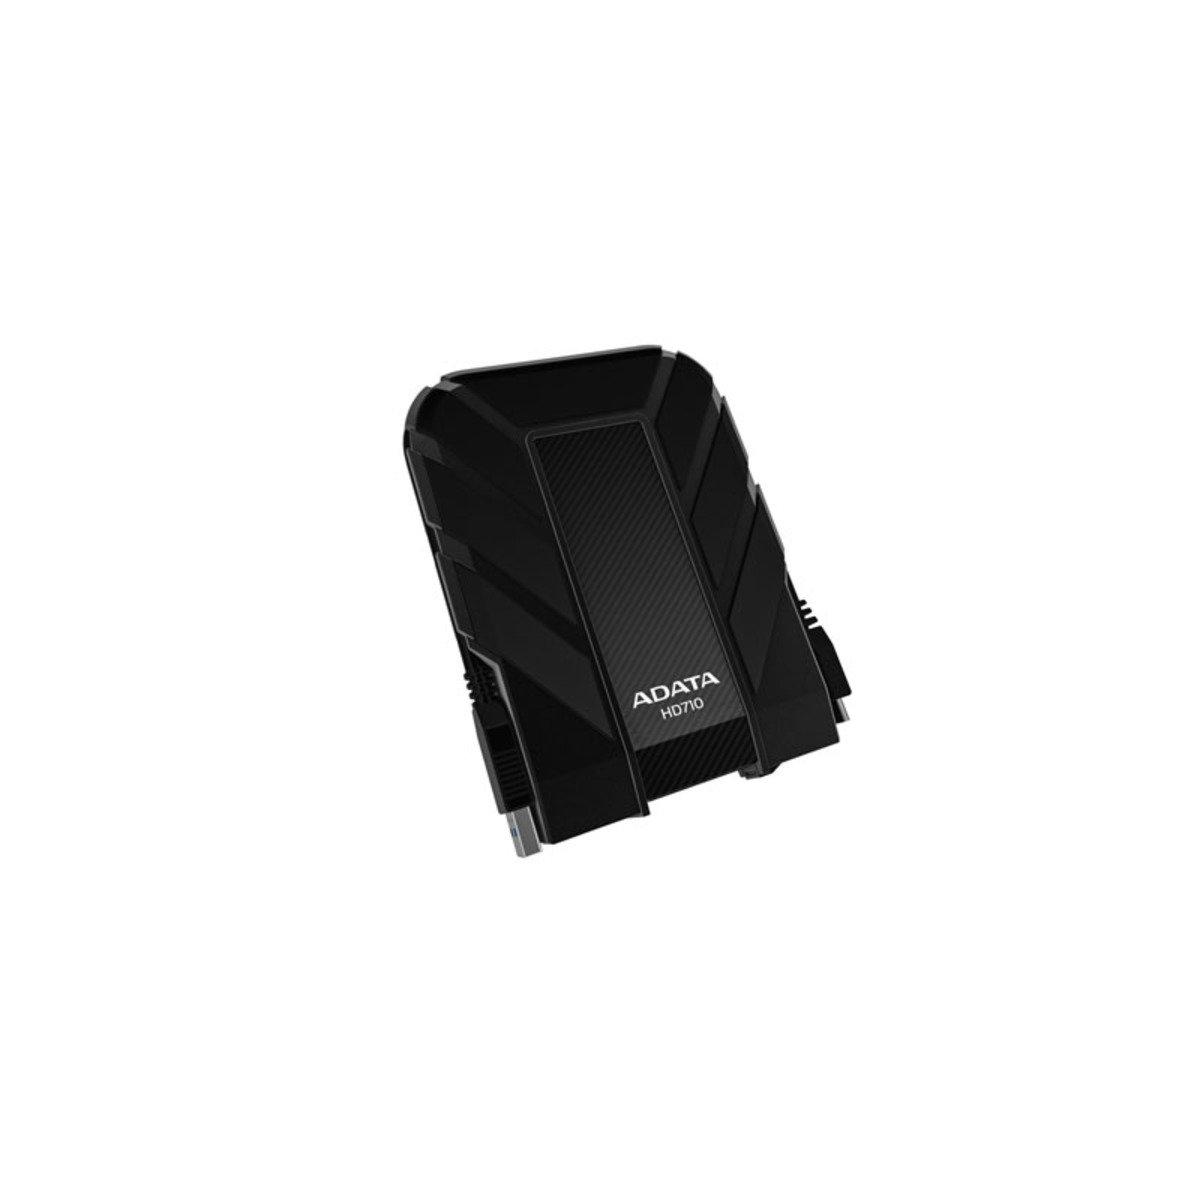 IP68 防水、防塵、抗震 USB 3.0 外置硬碟 HD710 2TB 黑色